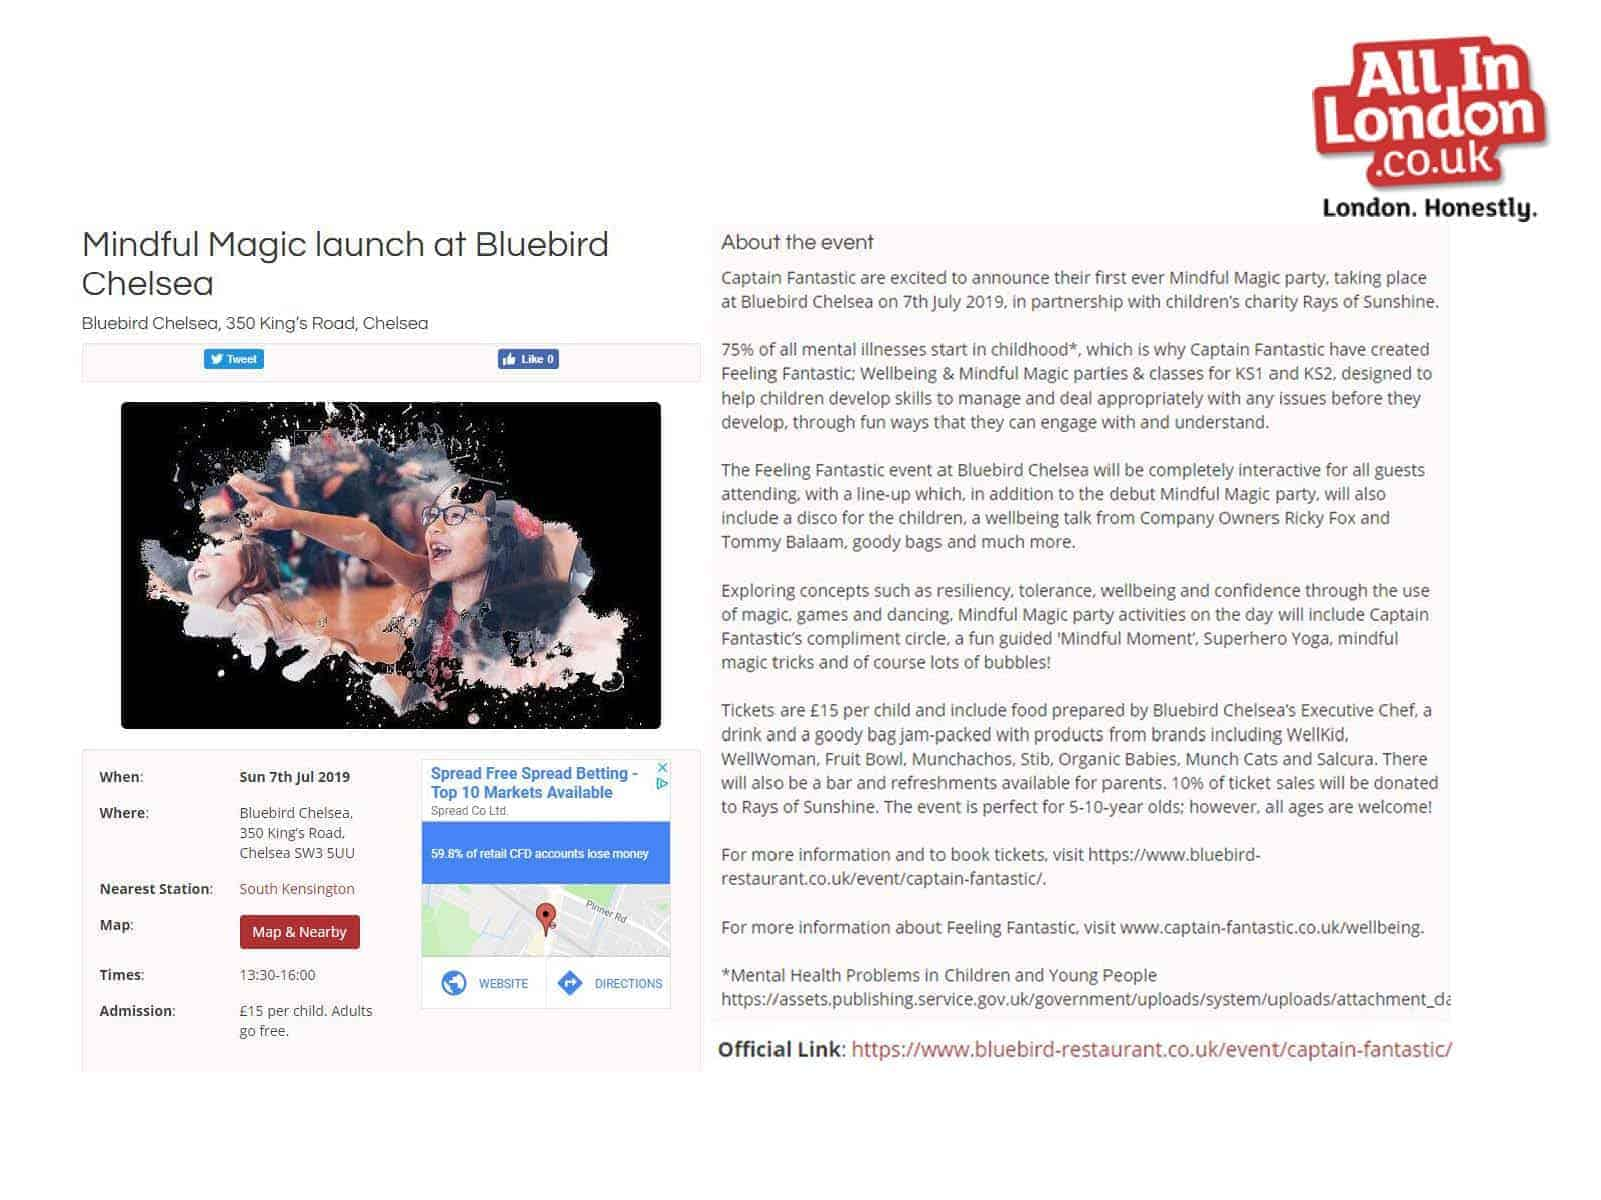 All-in-London-Captain-Fantastic-Press-Coverage